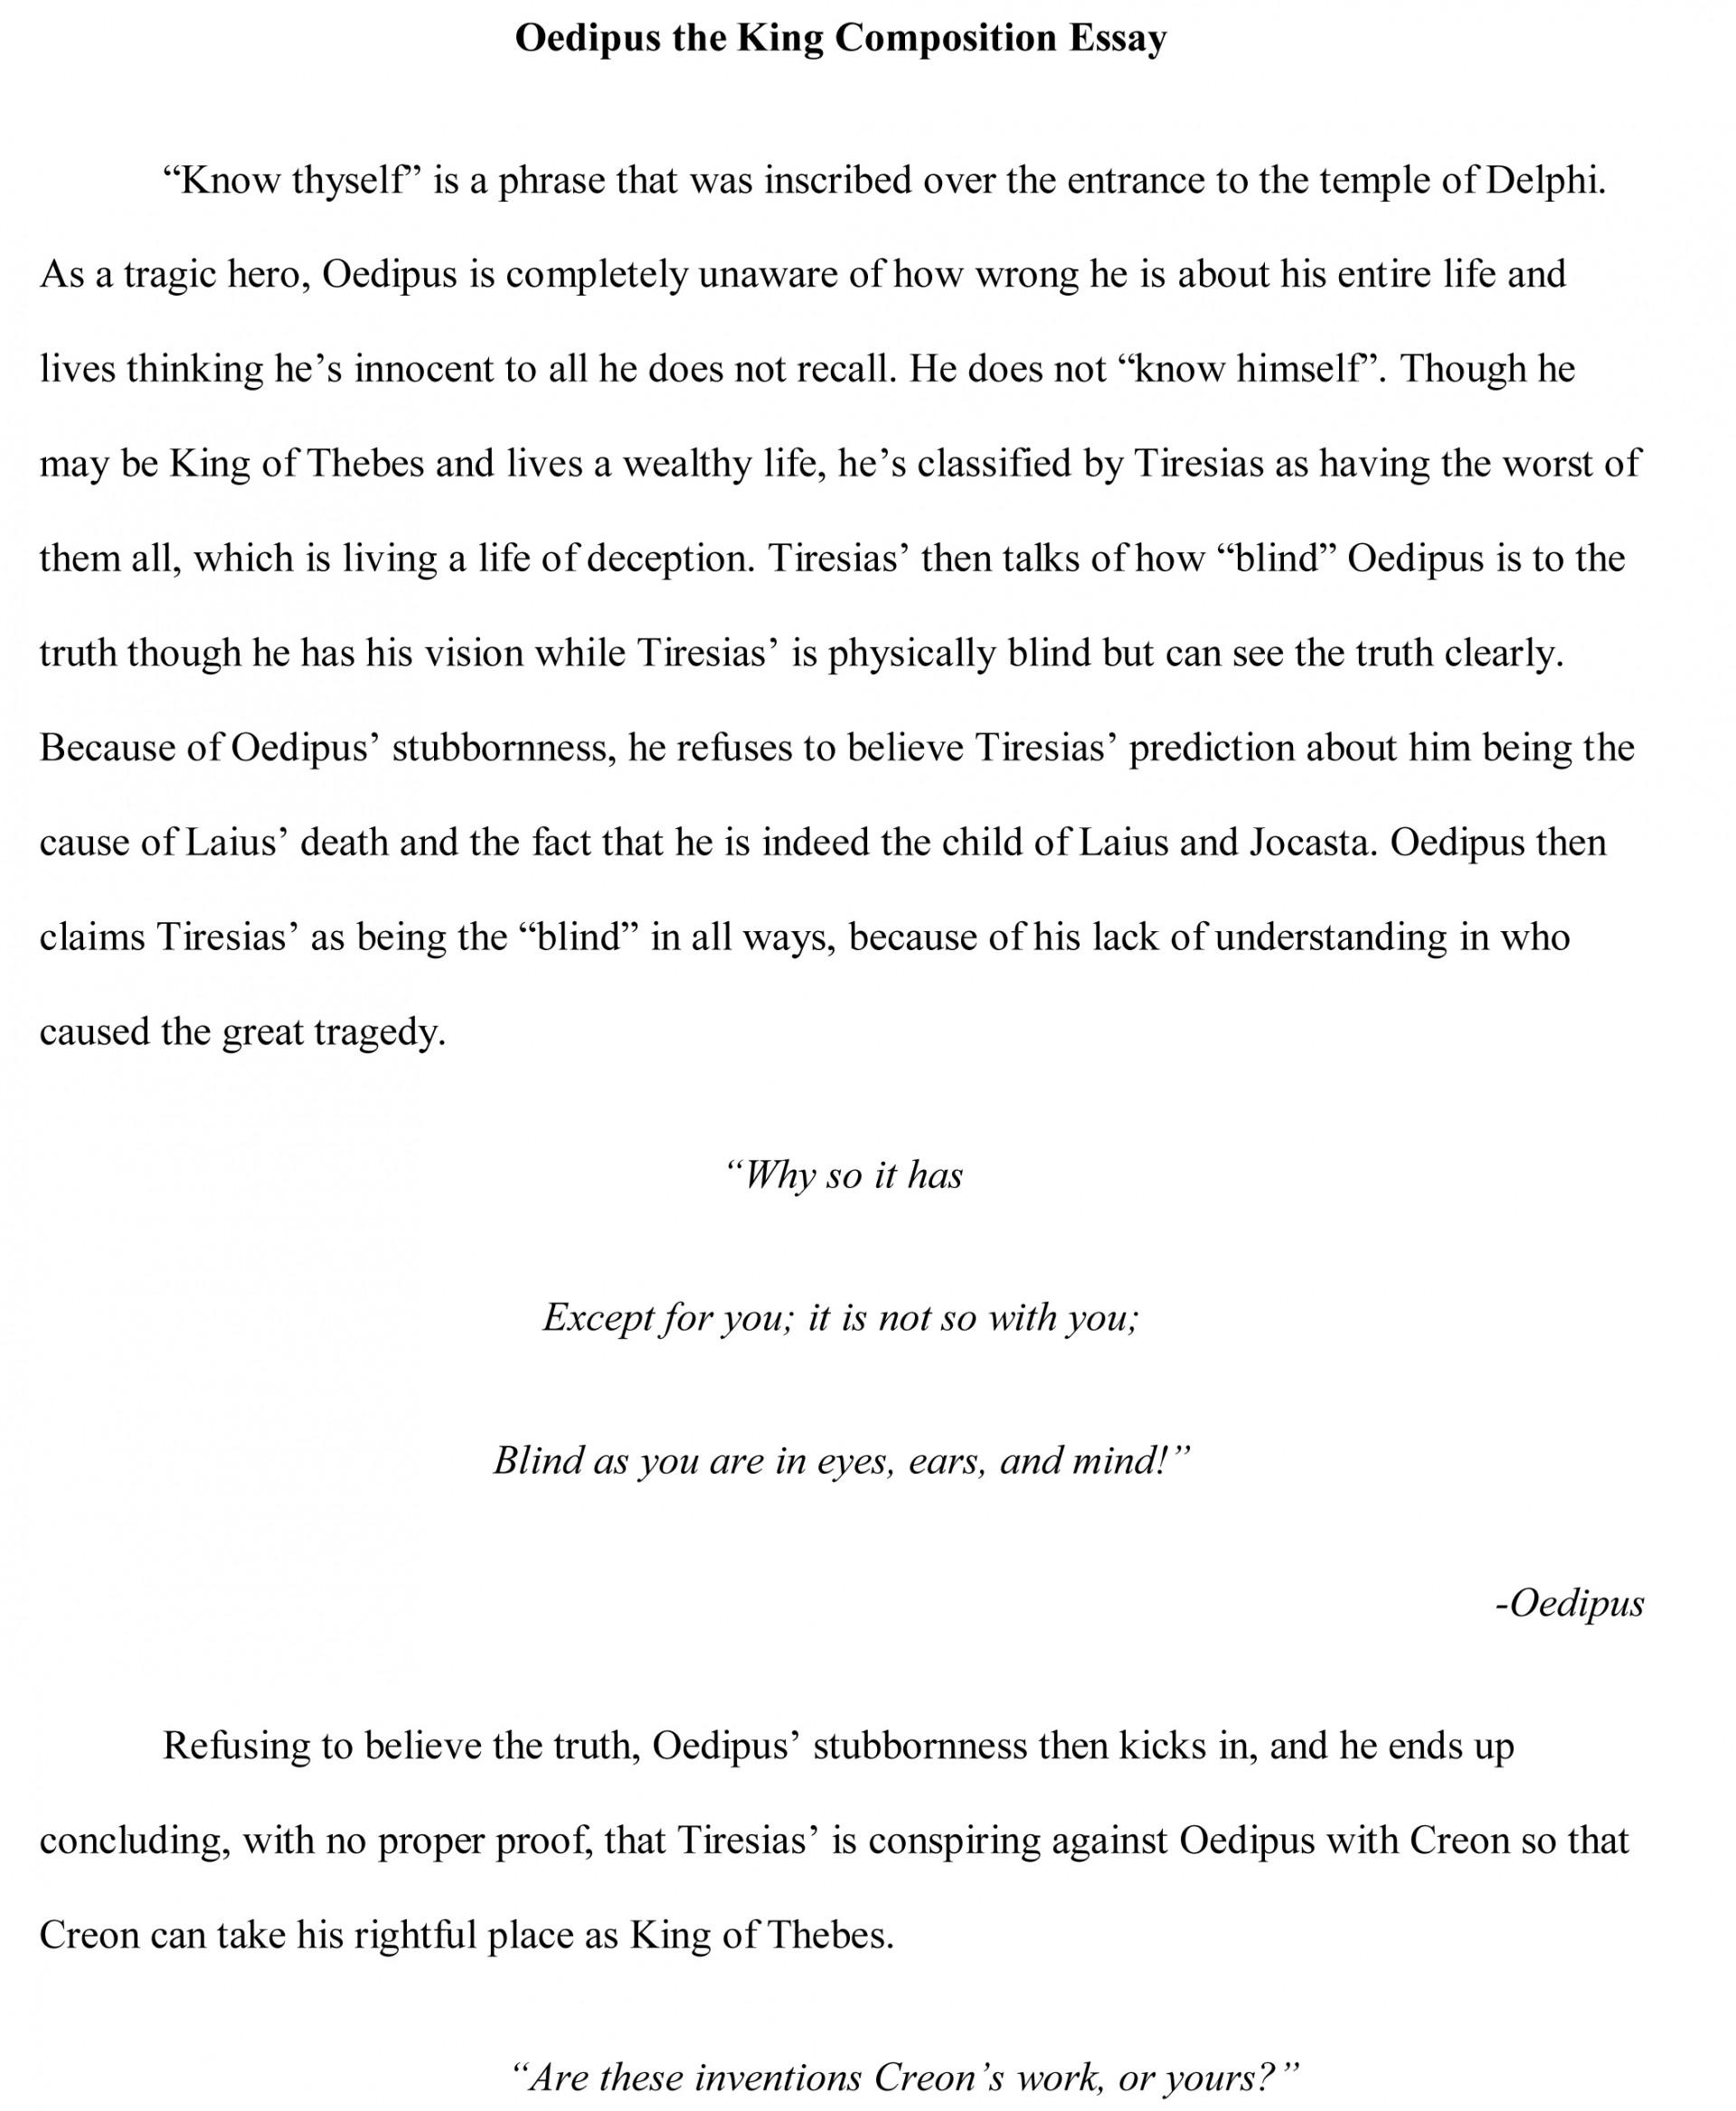 012 Interesting Essay Topics Oedipus Free Sample Amazing For Grade 7 9 Pat 7th 1920